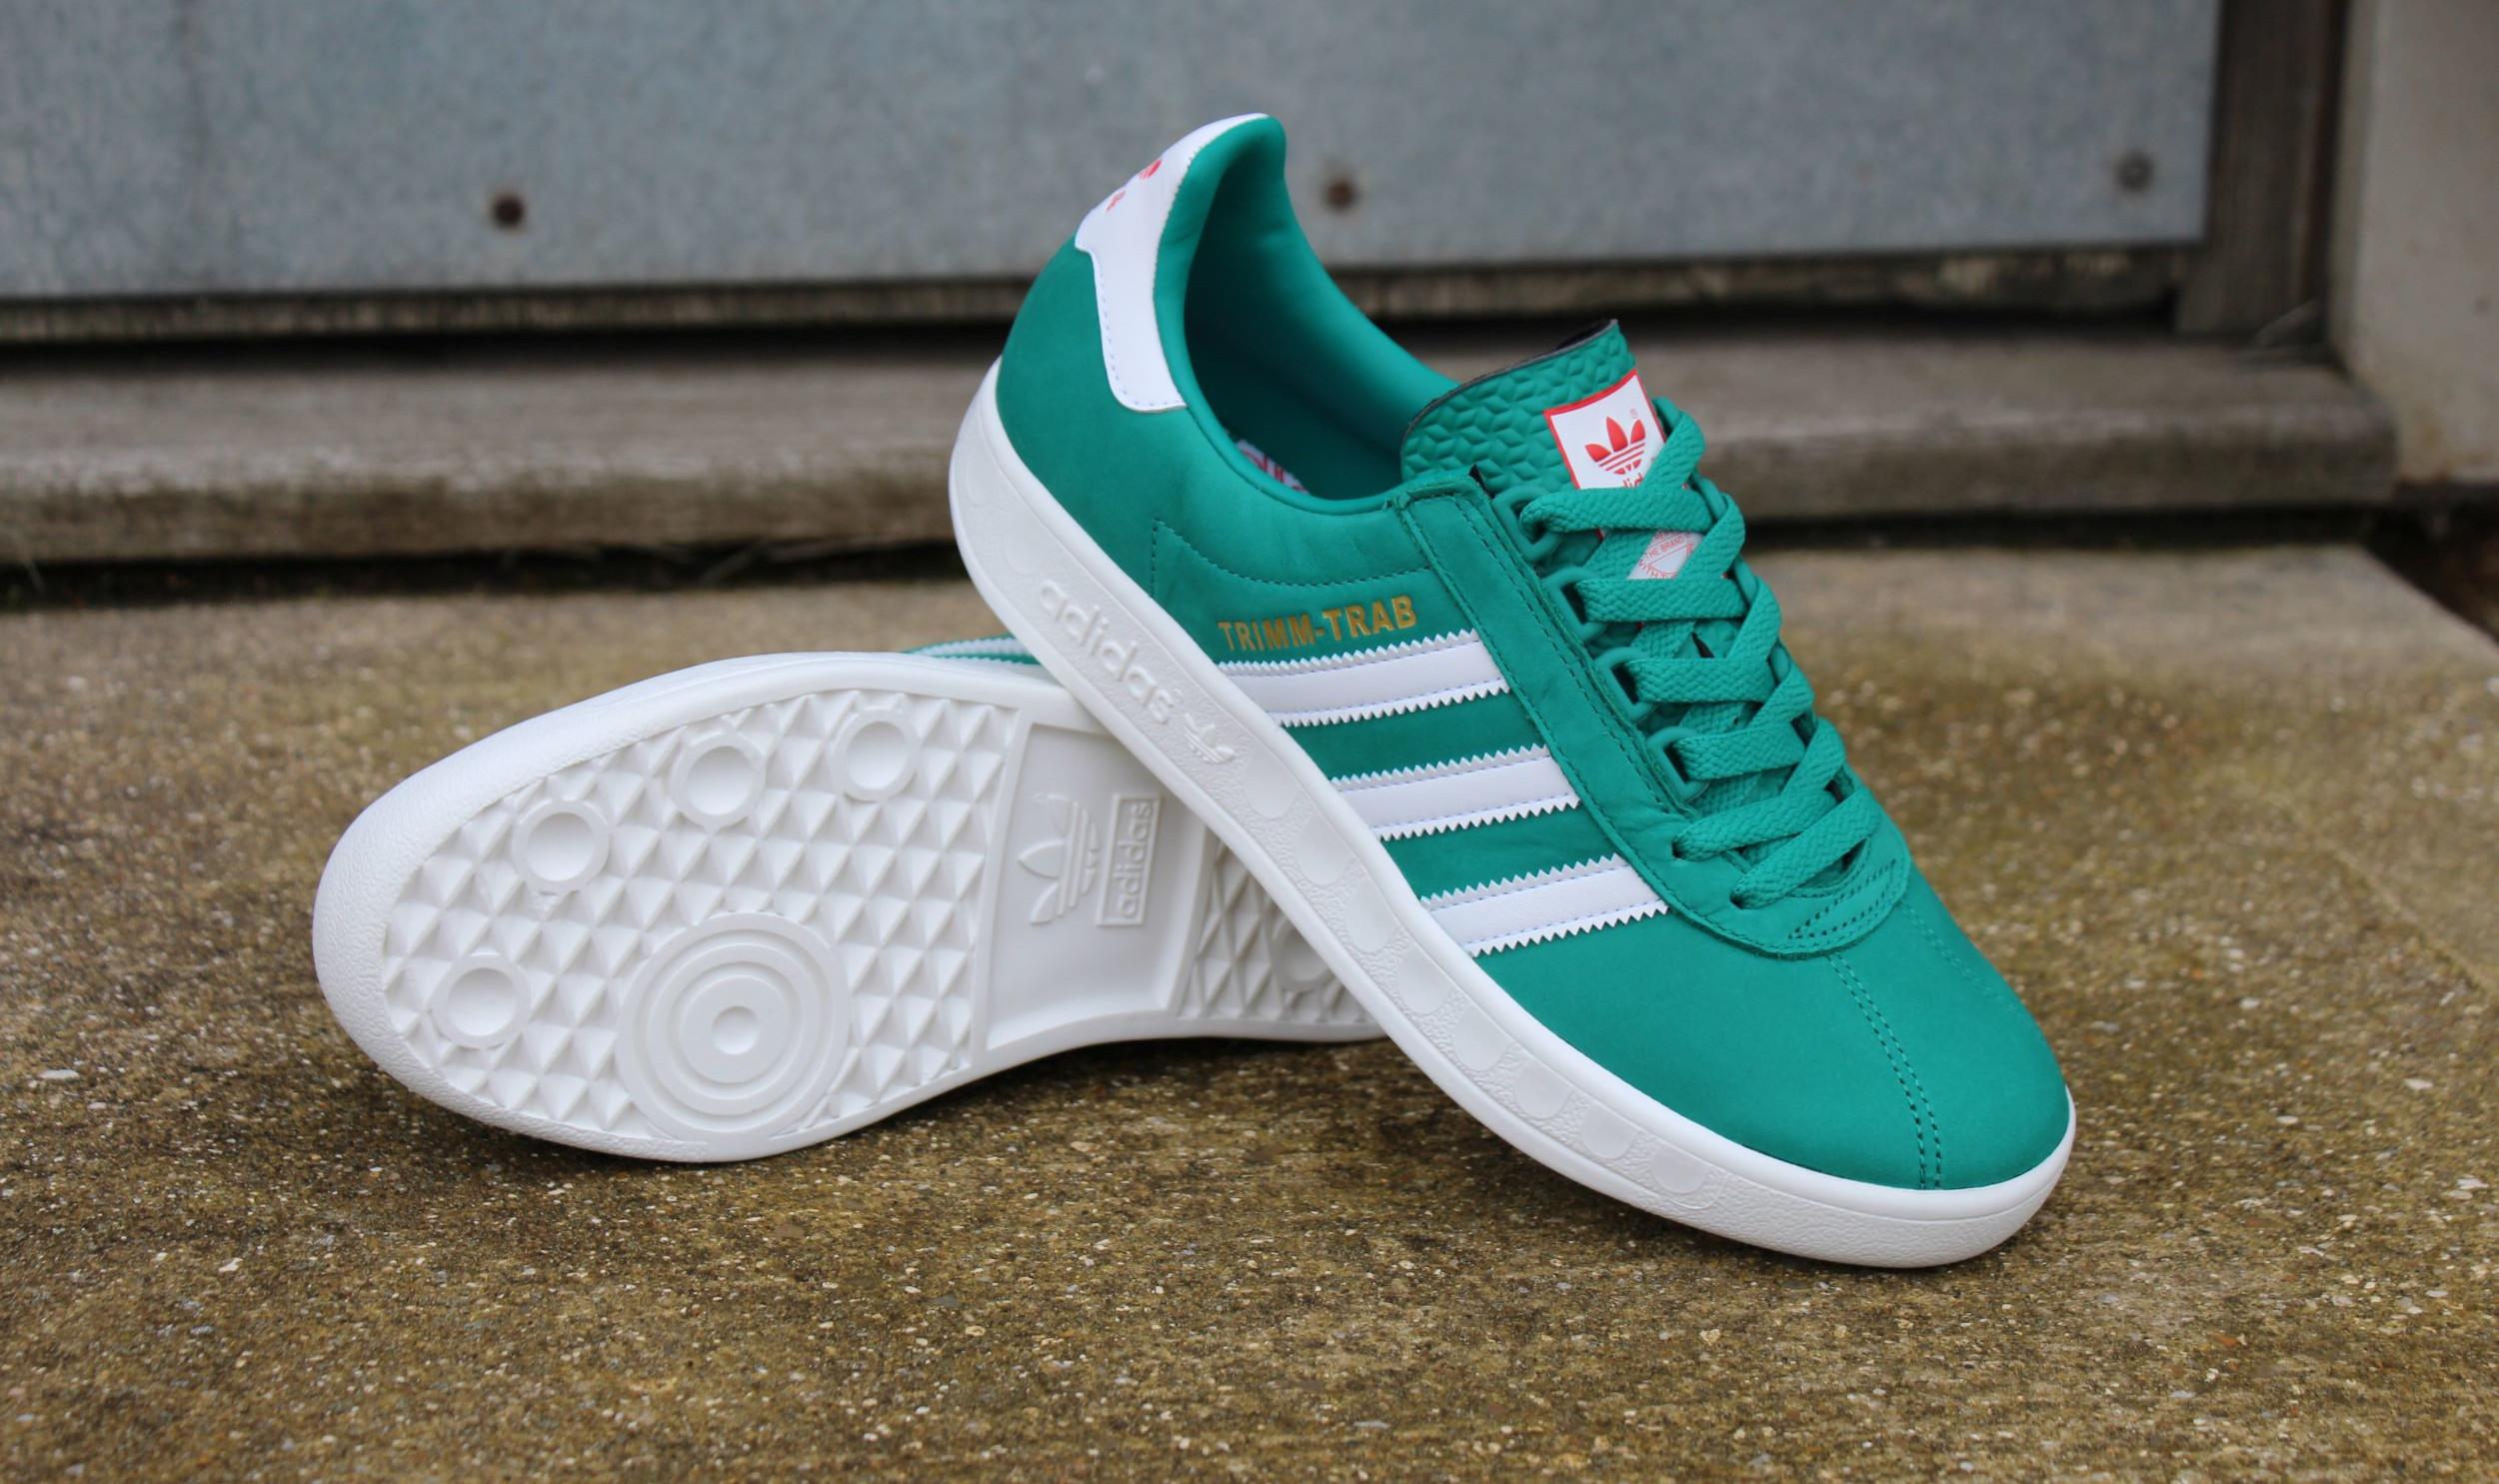 adidas trimm trab glory green